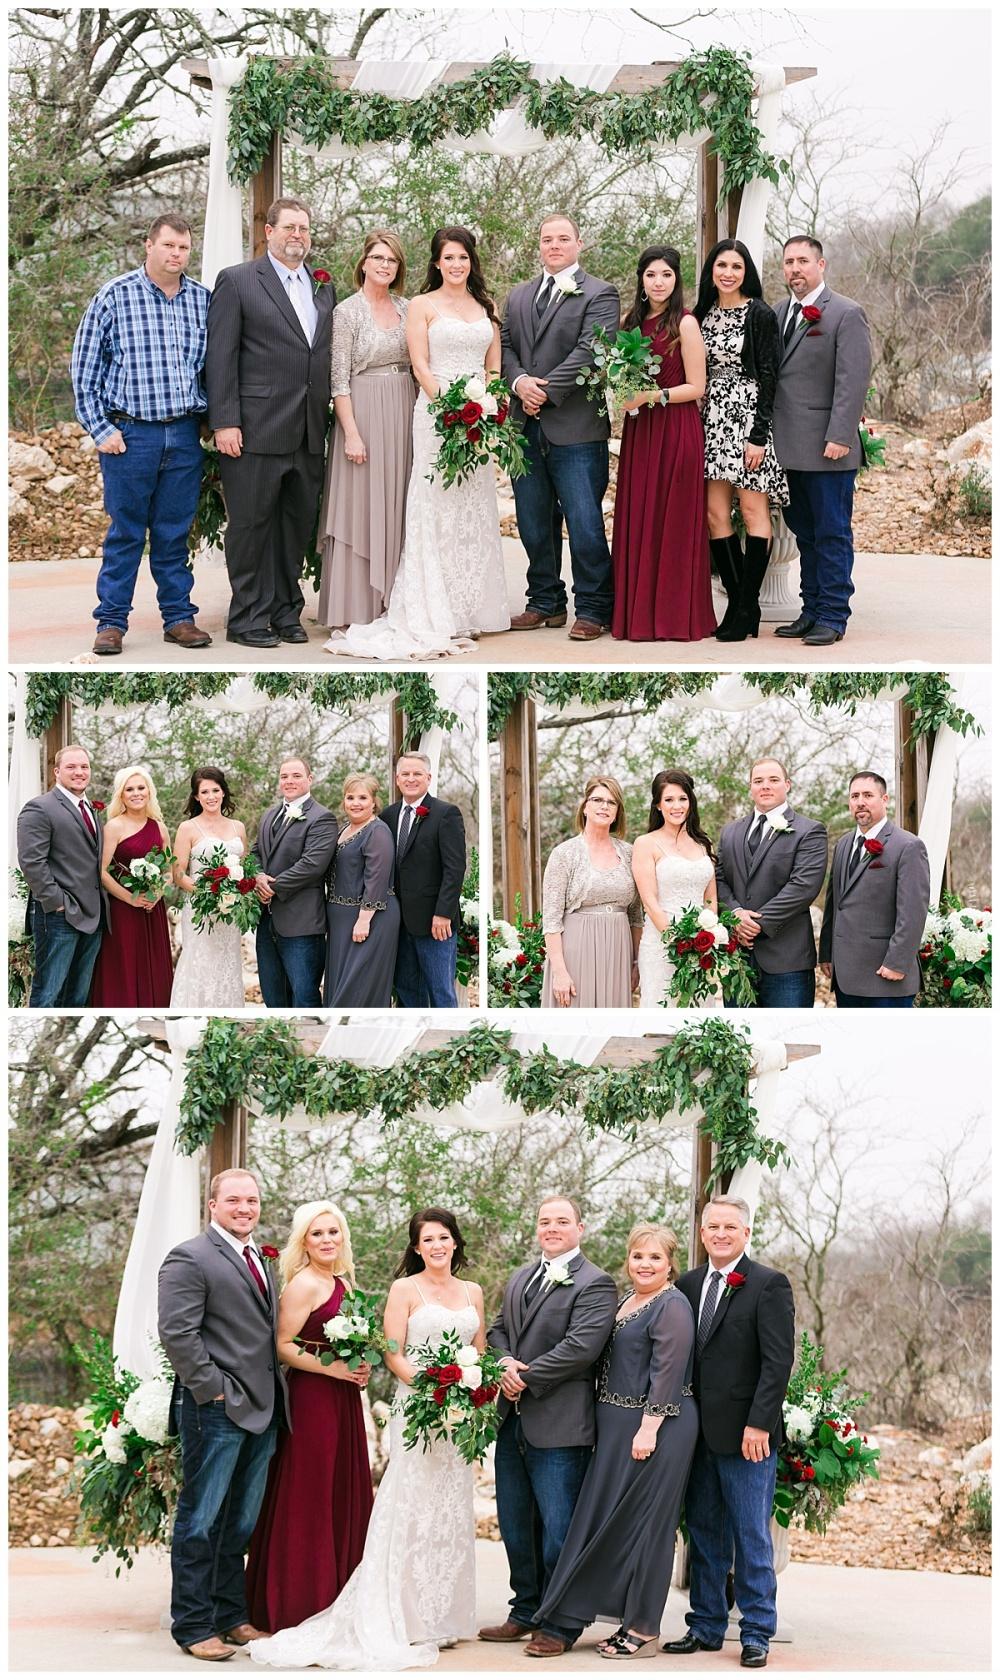 Carly-Barton-Photography-Geronimo-Oaks-Wedding-Venue-Texas-Hill-Country-Ronnie-Sarah_0110.jpg